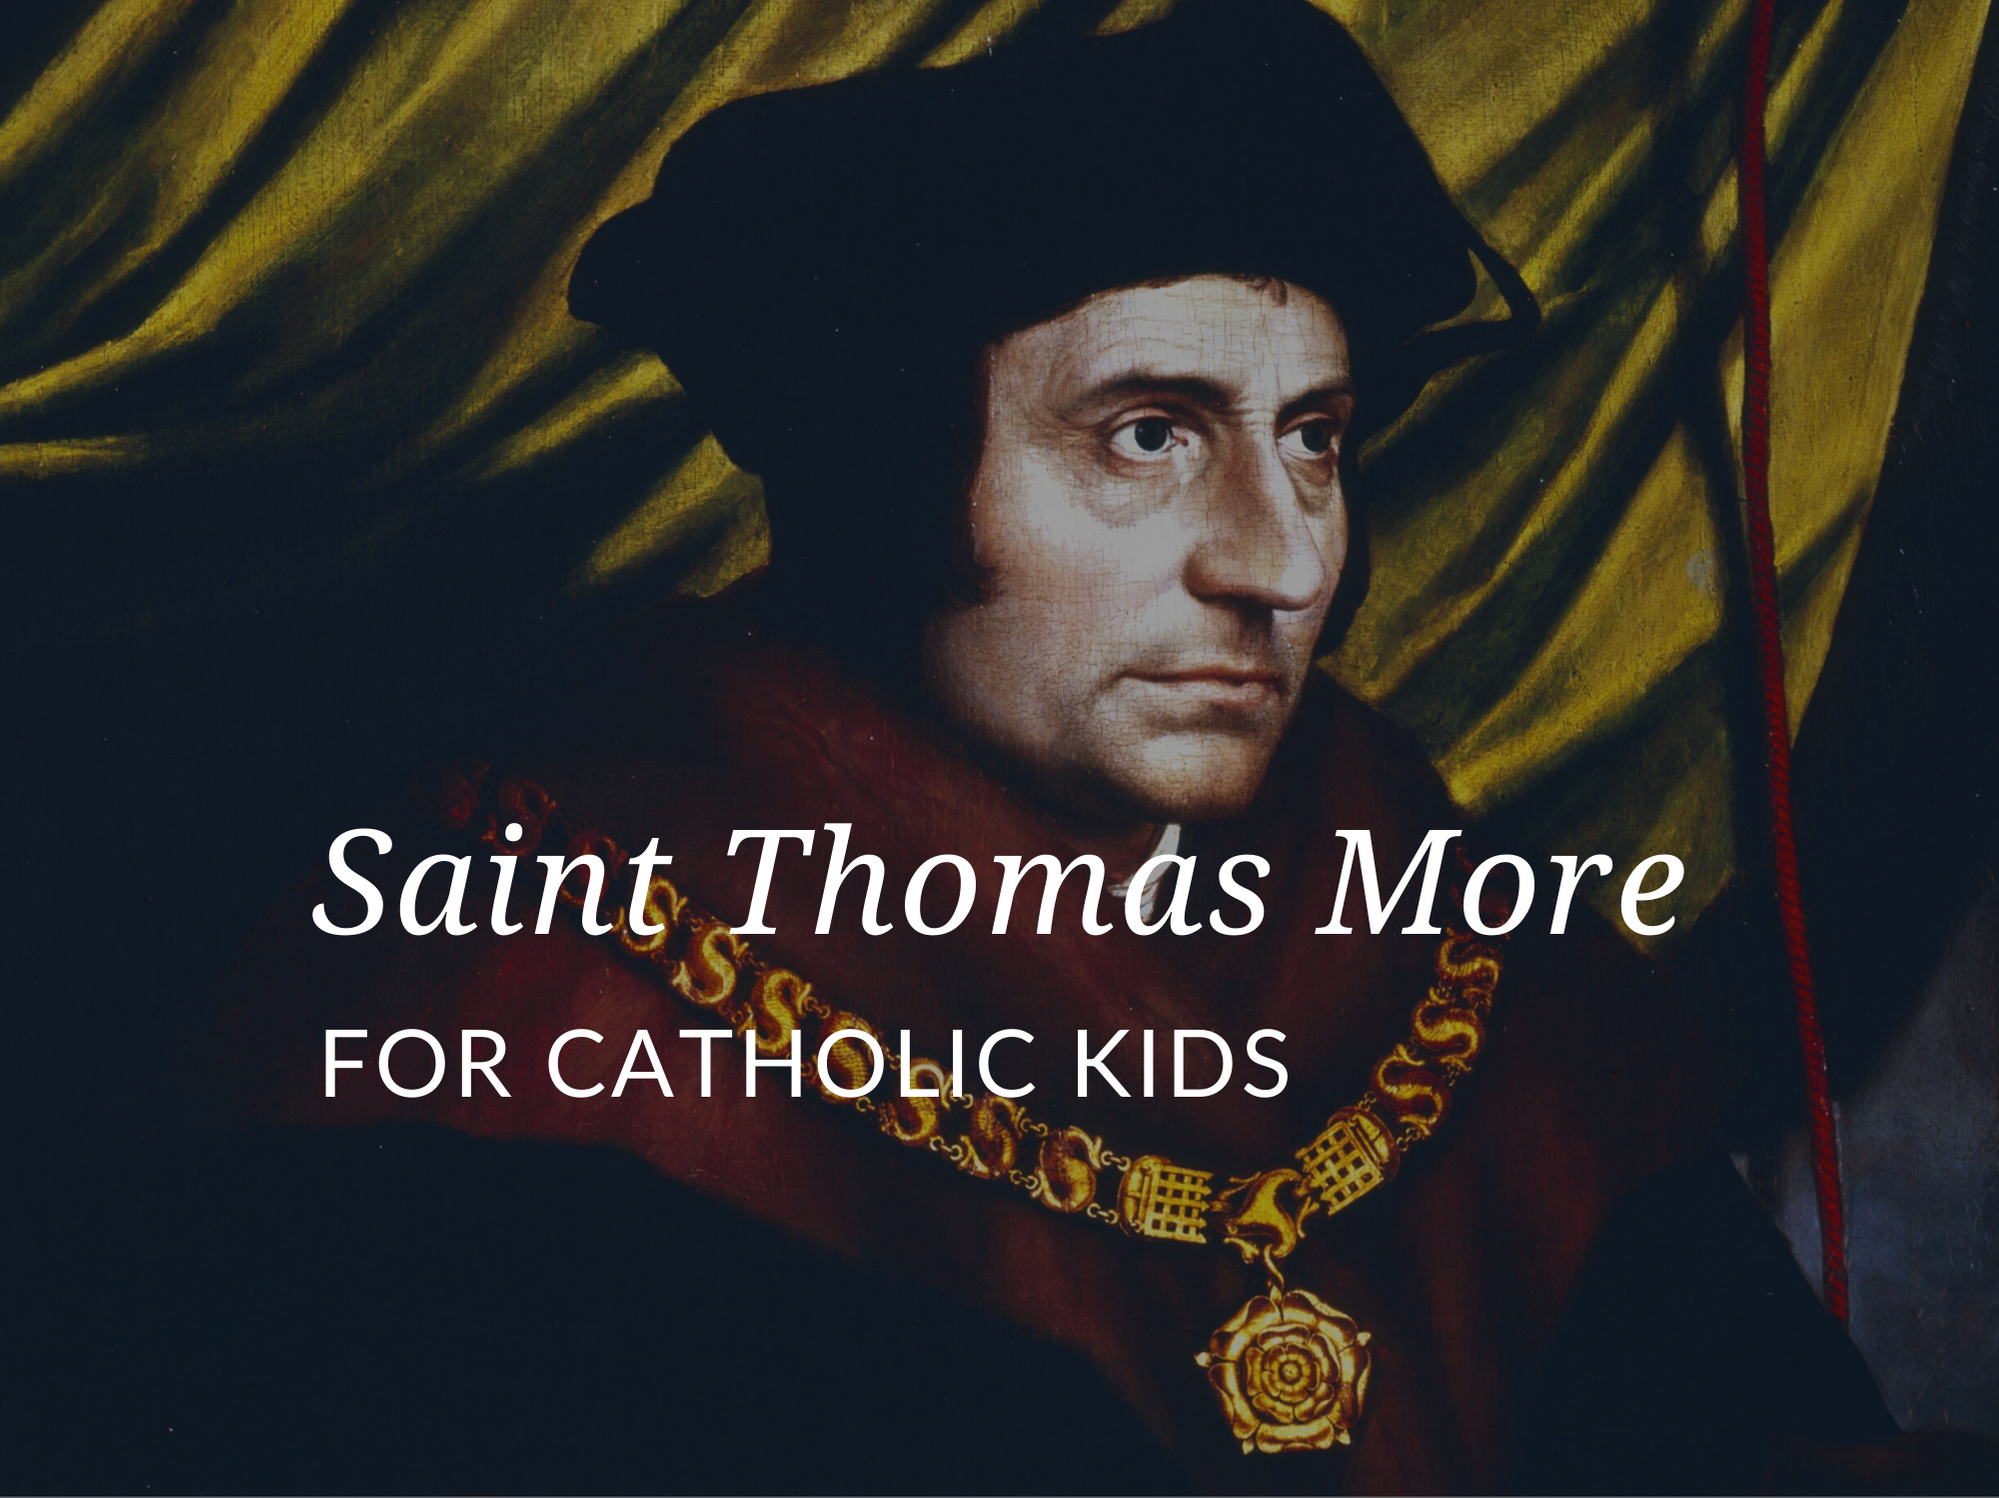 popular-saints-for-kids-st-thomas-more-for-catholic-kids